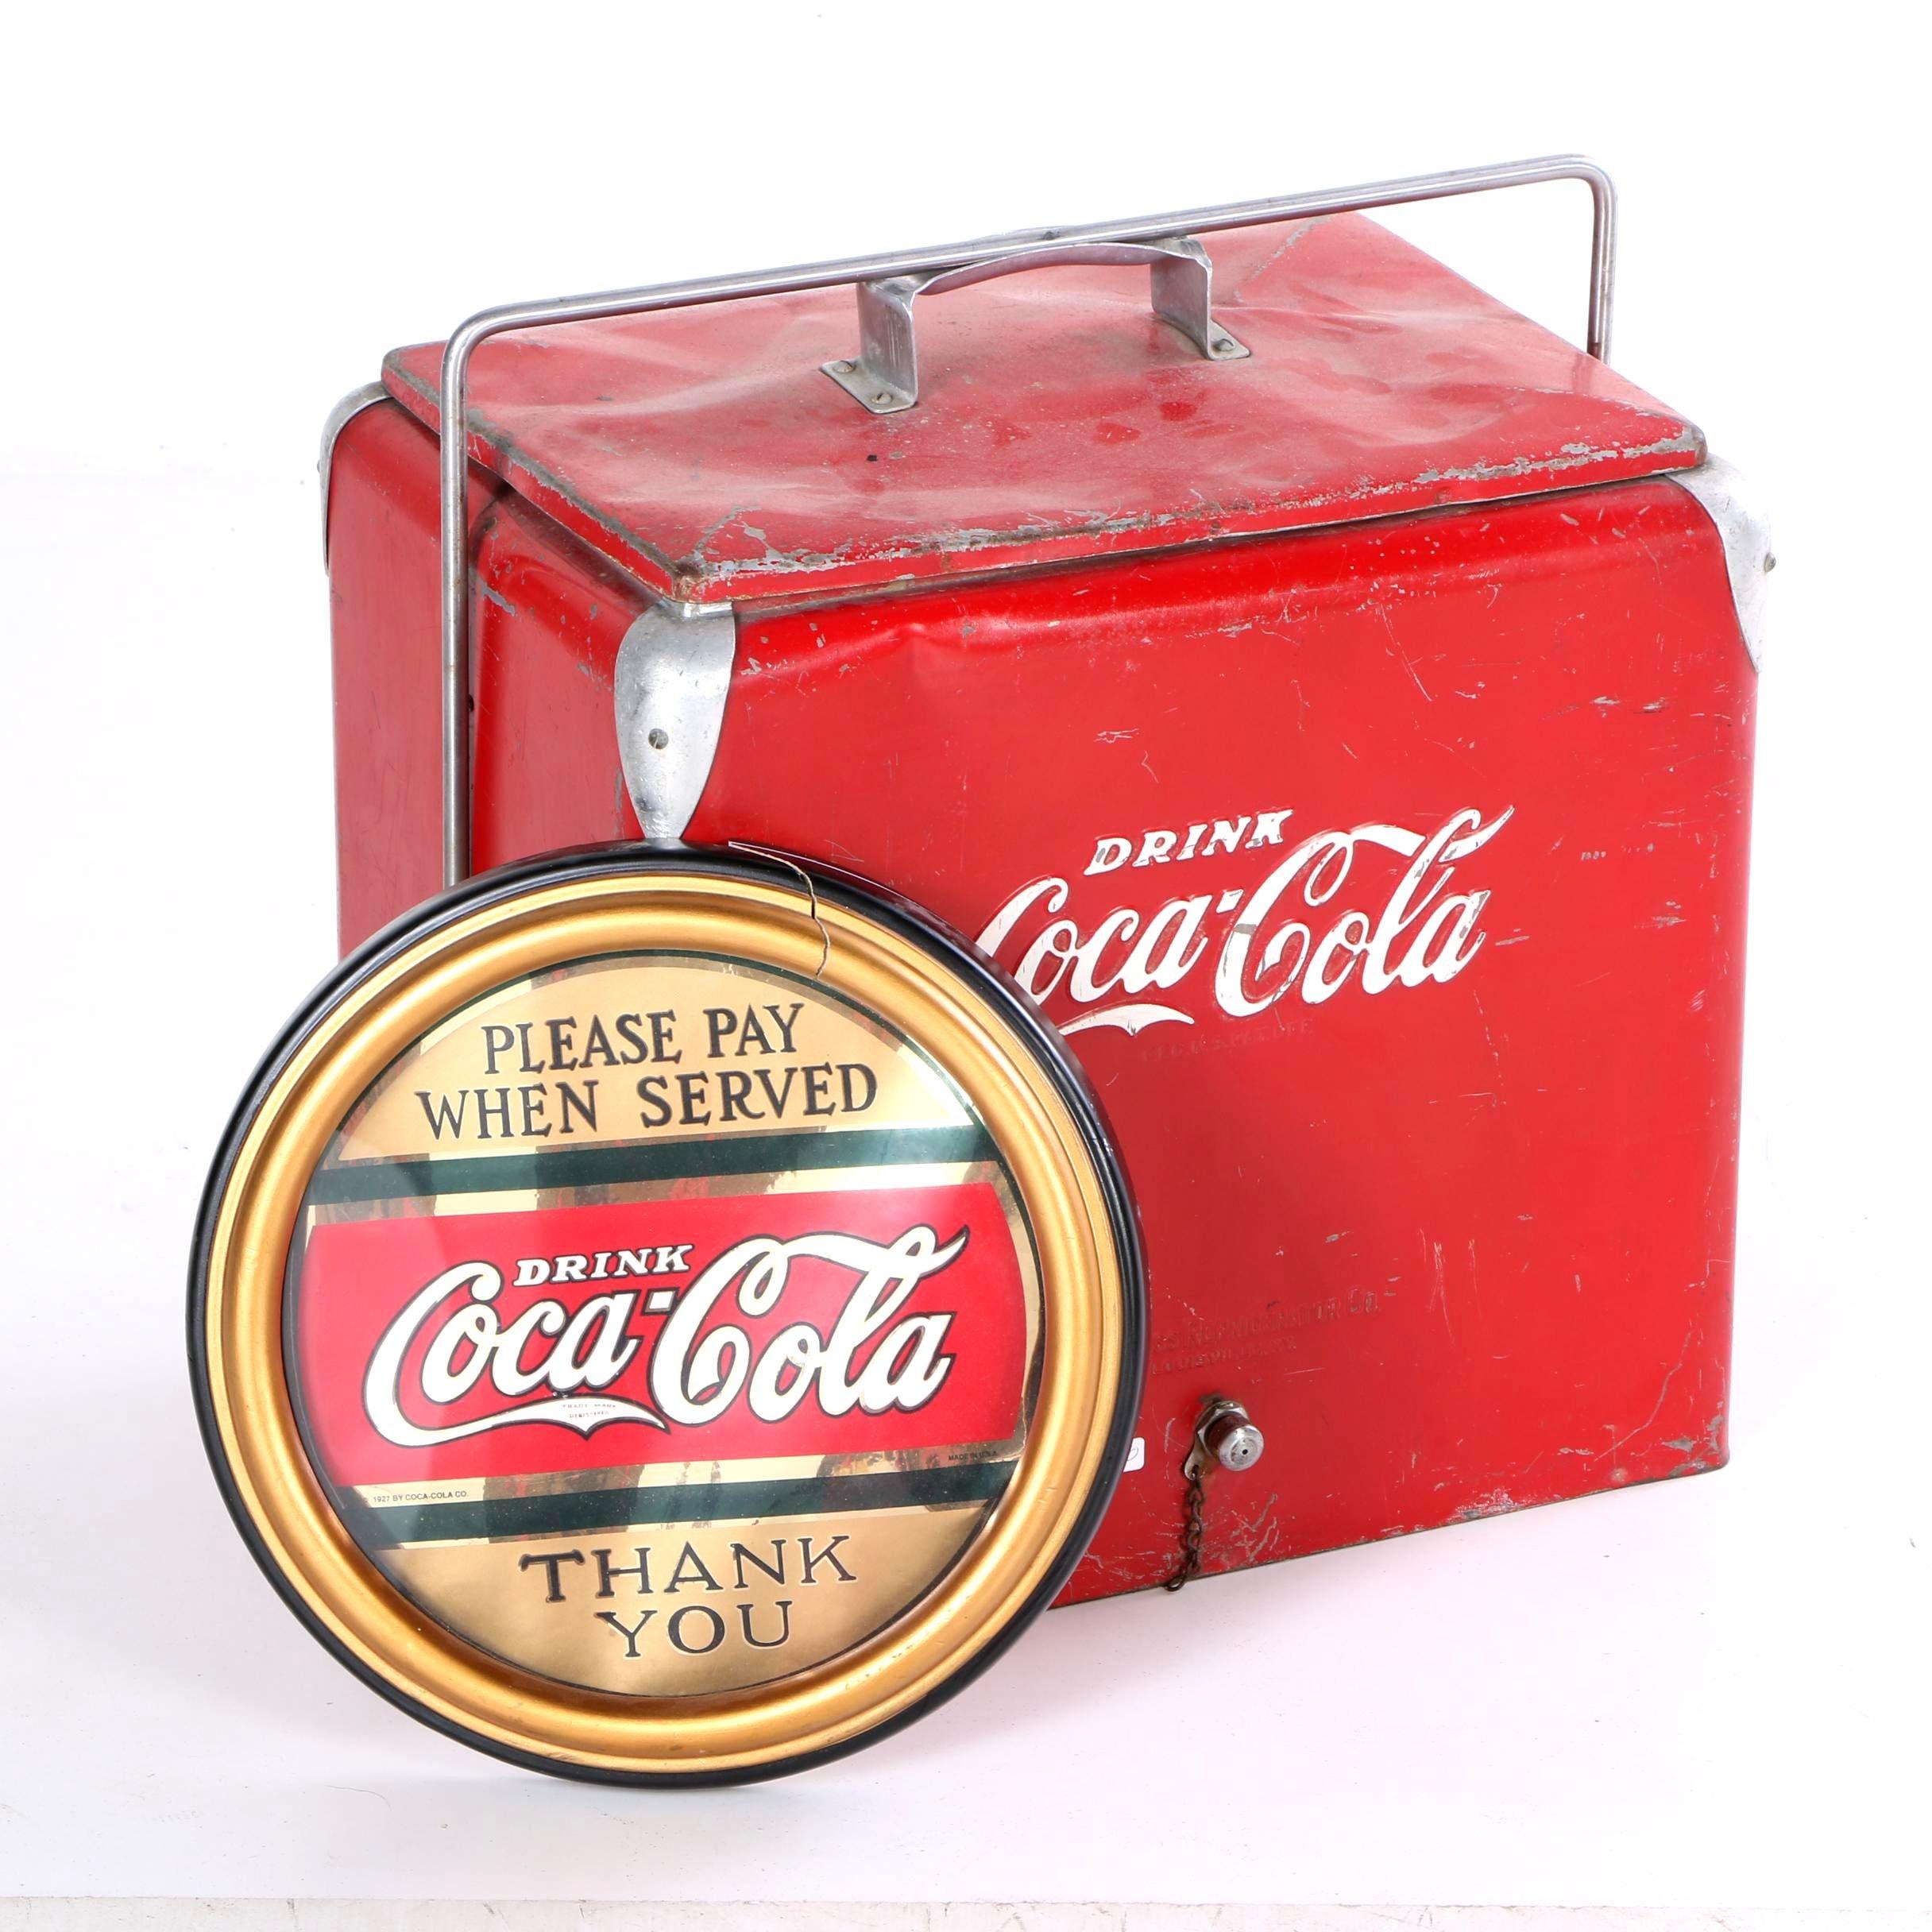 Vintage Coca-Cola Cooler and Sign